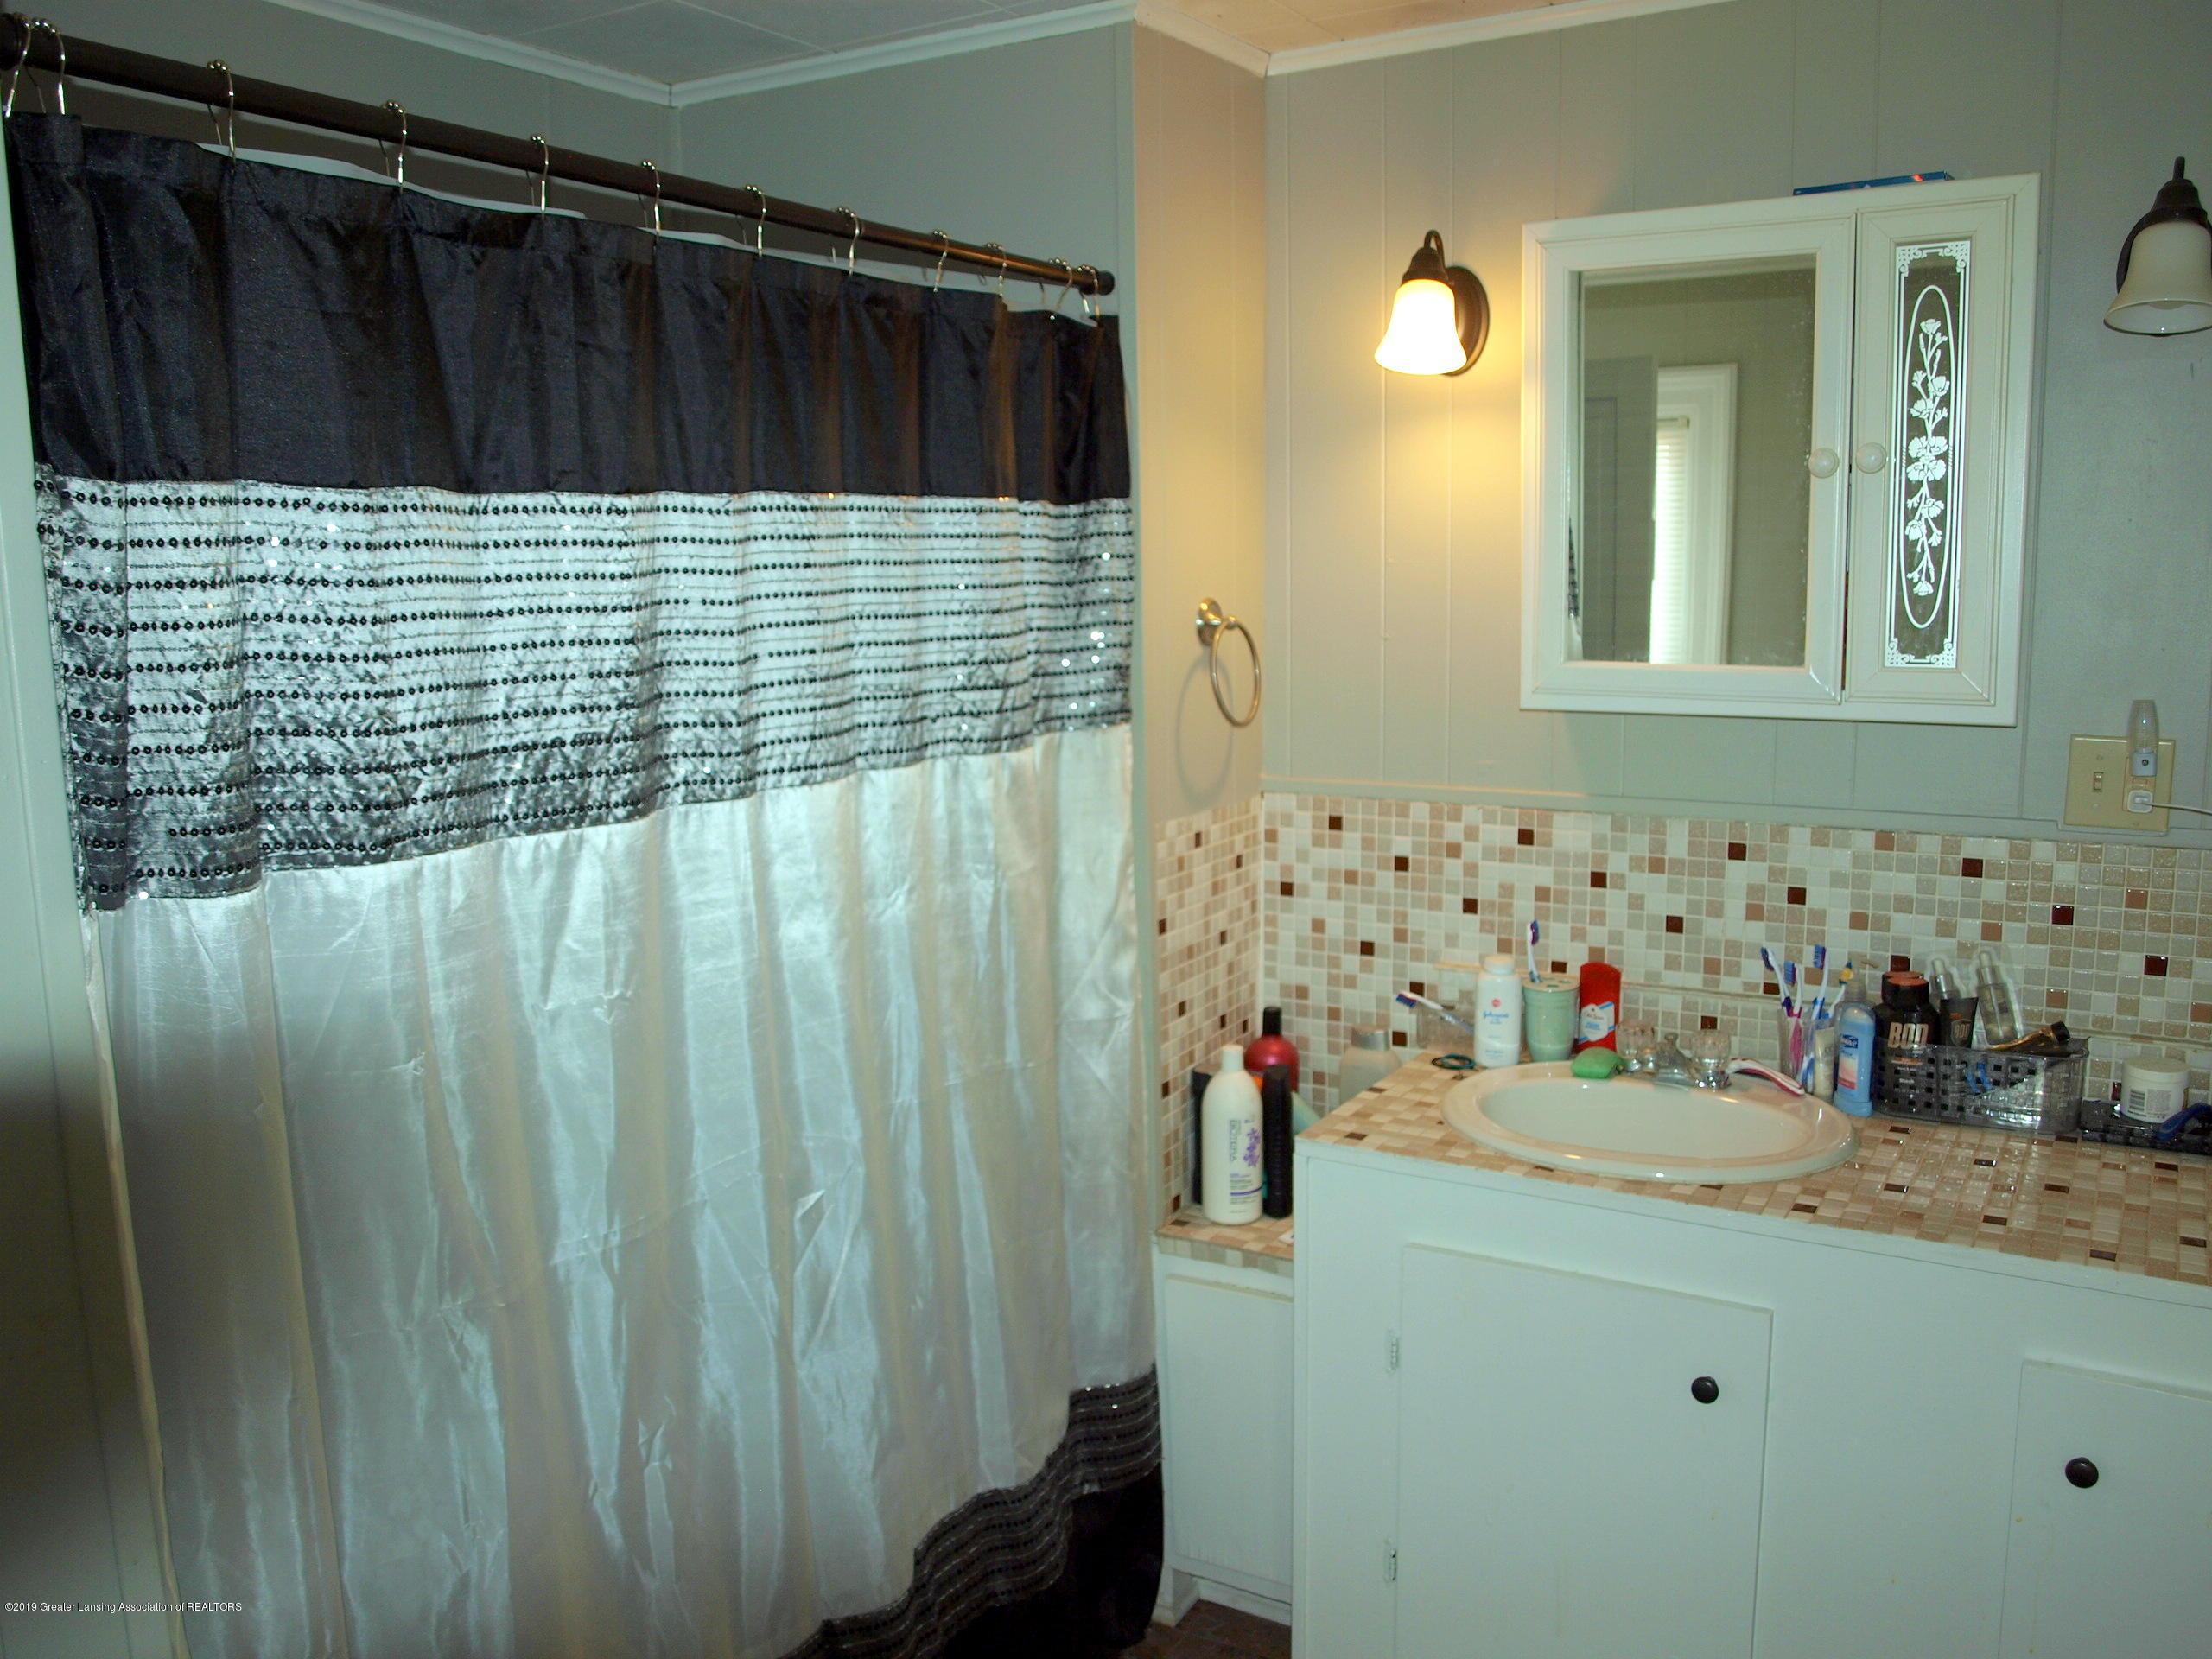 211 Wight St - Bathroom - 5